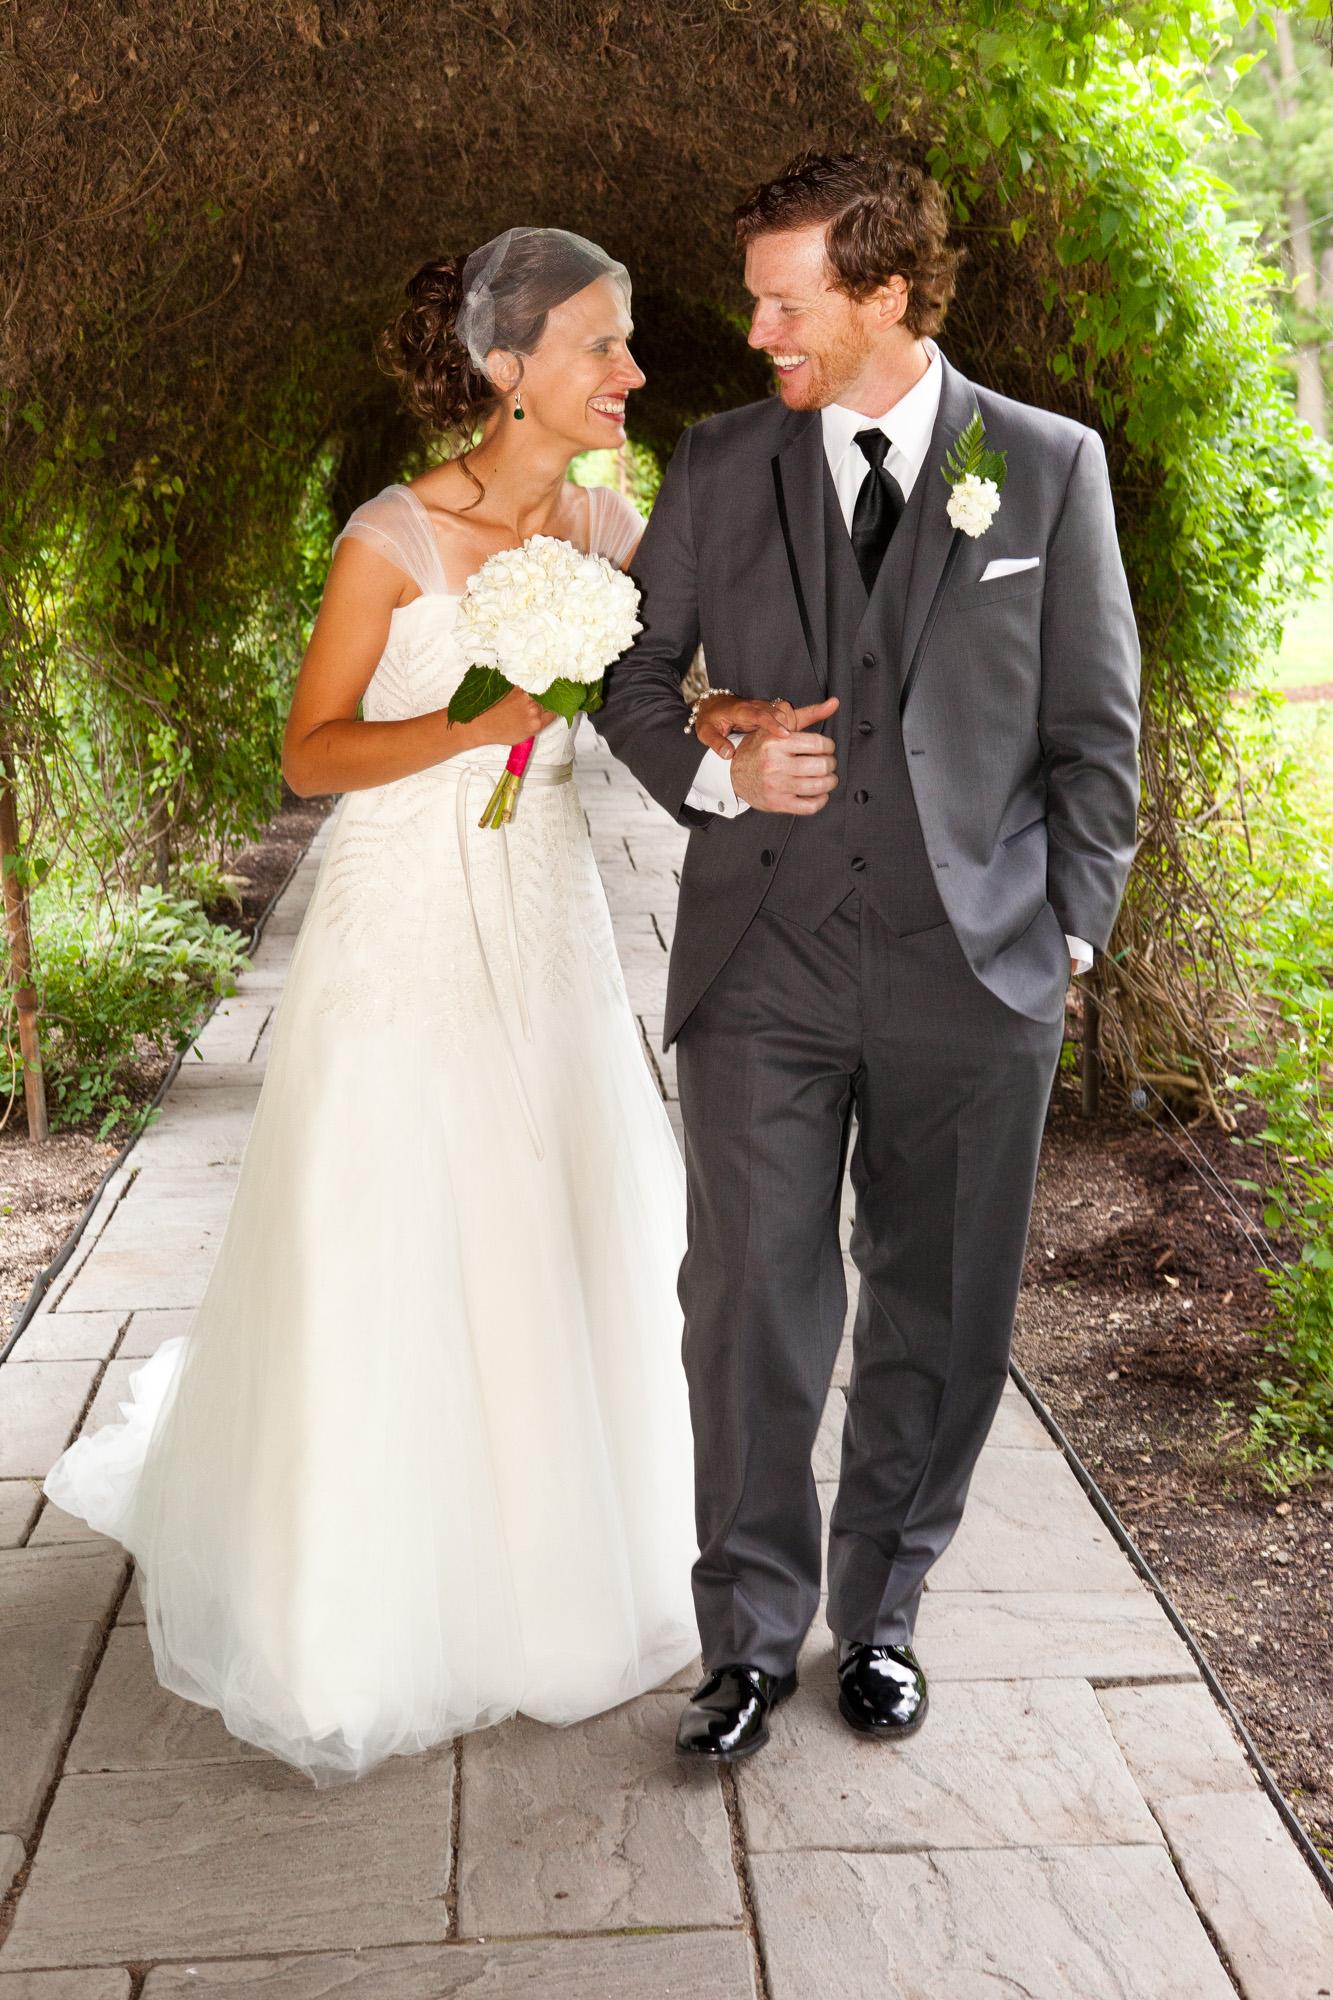 WeddingPortfolio002.jpg